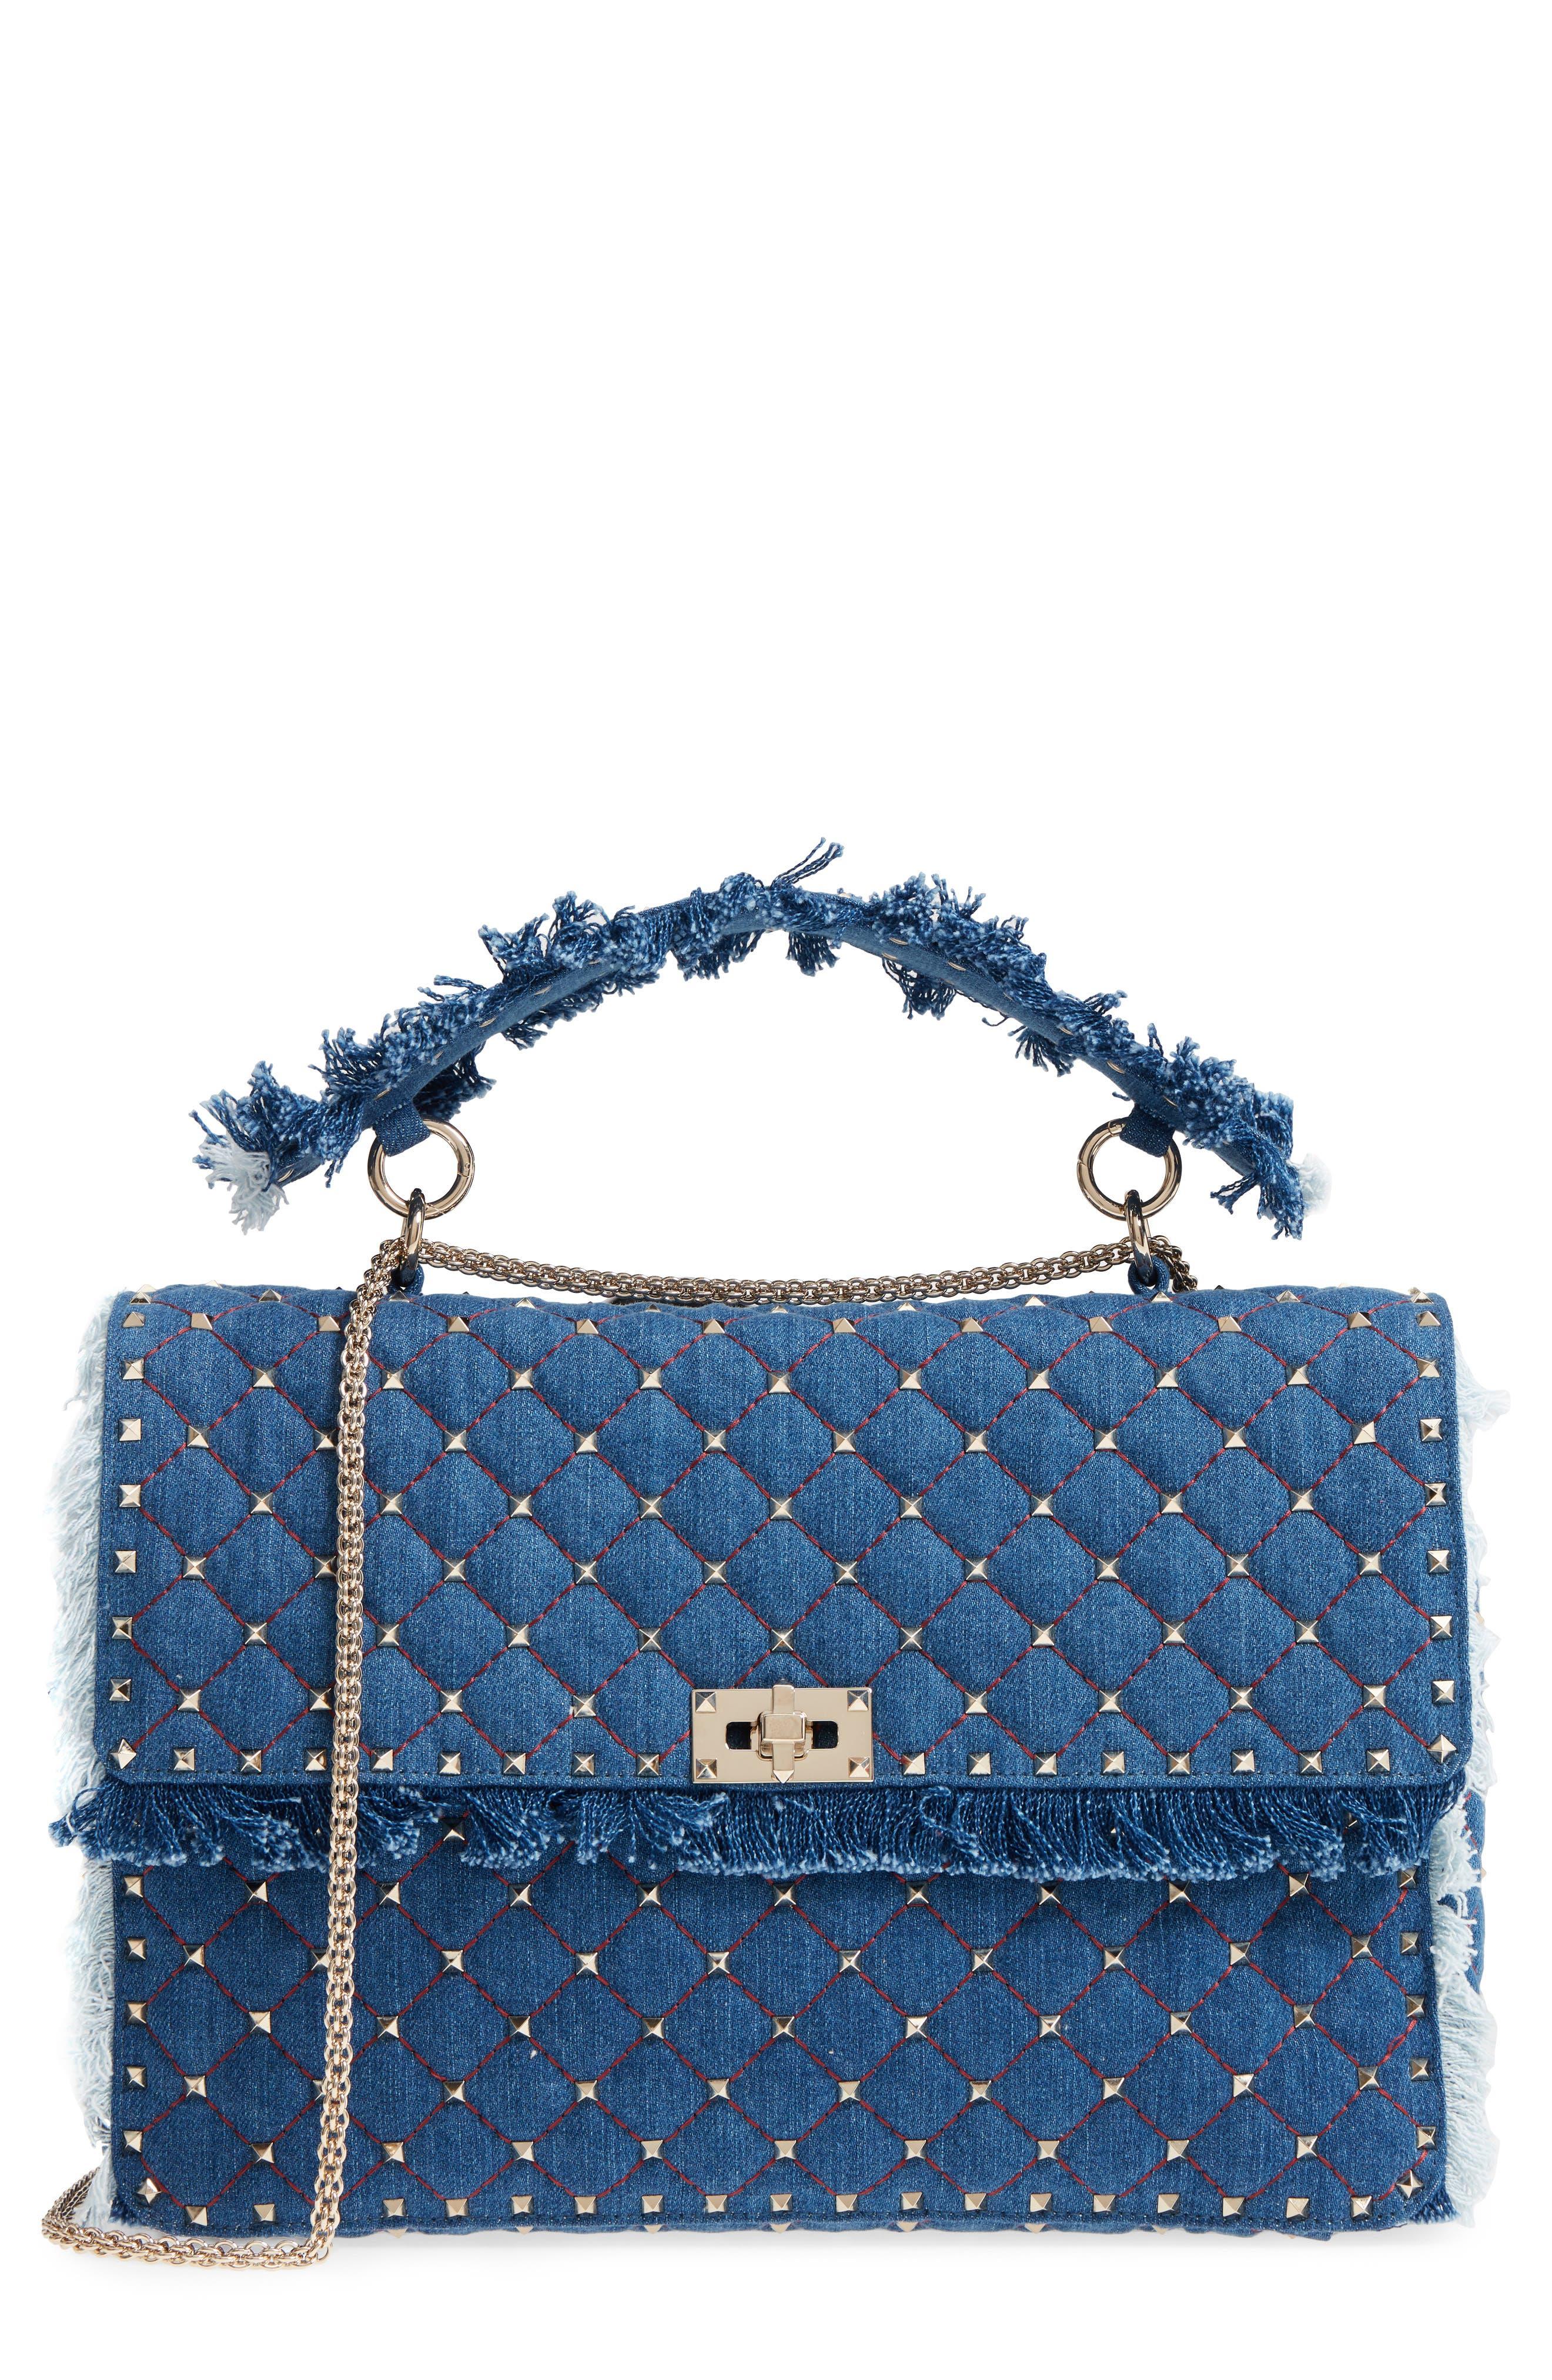 VALENTINO GARAVANI Maxi Rockstud Spike Denim Shoulder Bag